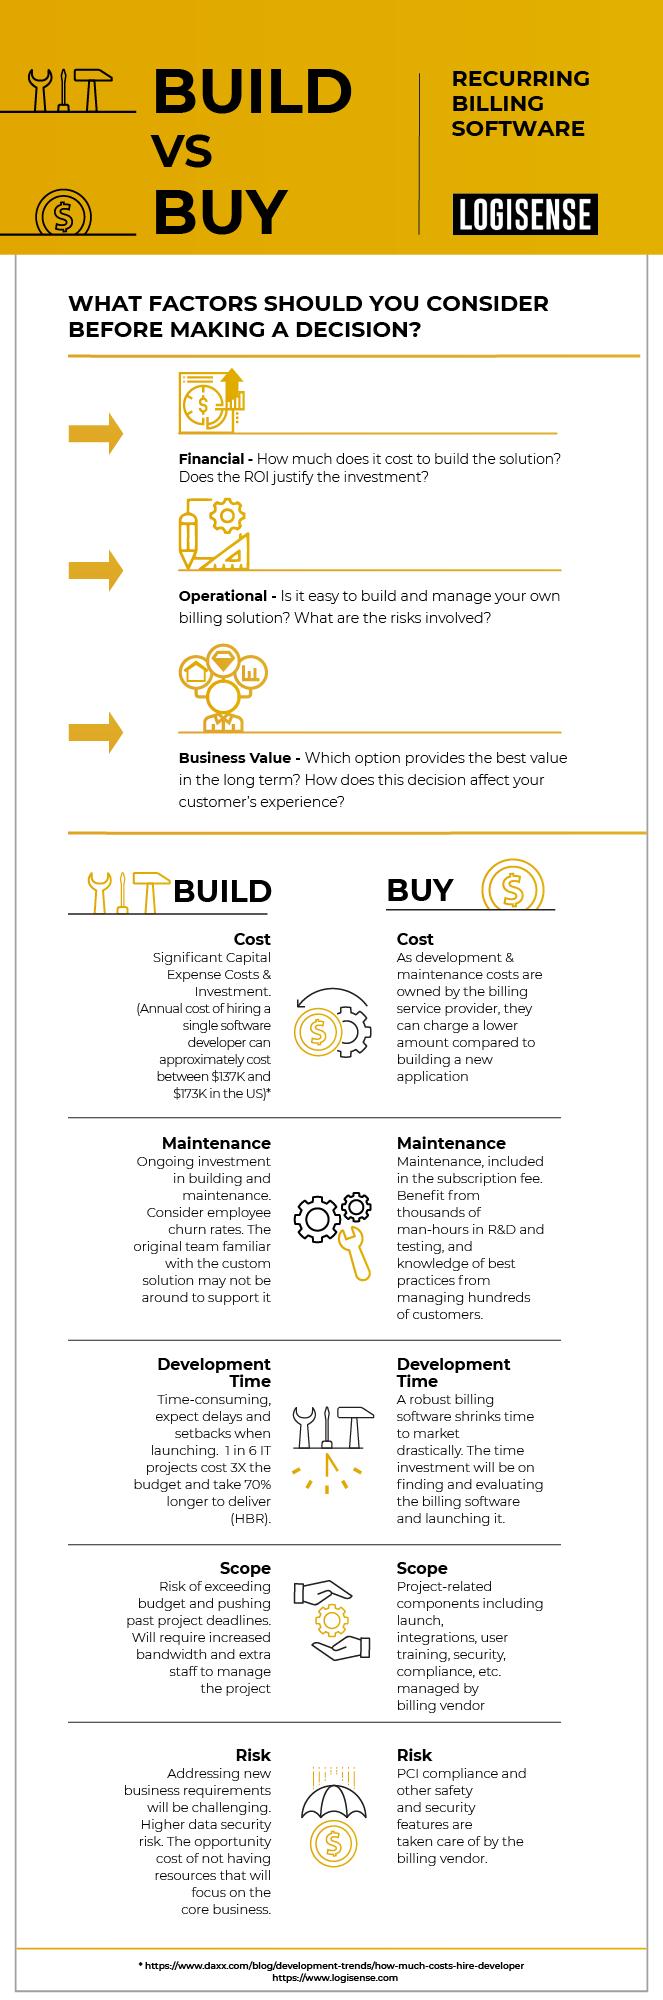 Build vs. Buy Infographic